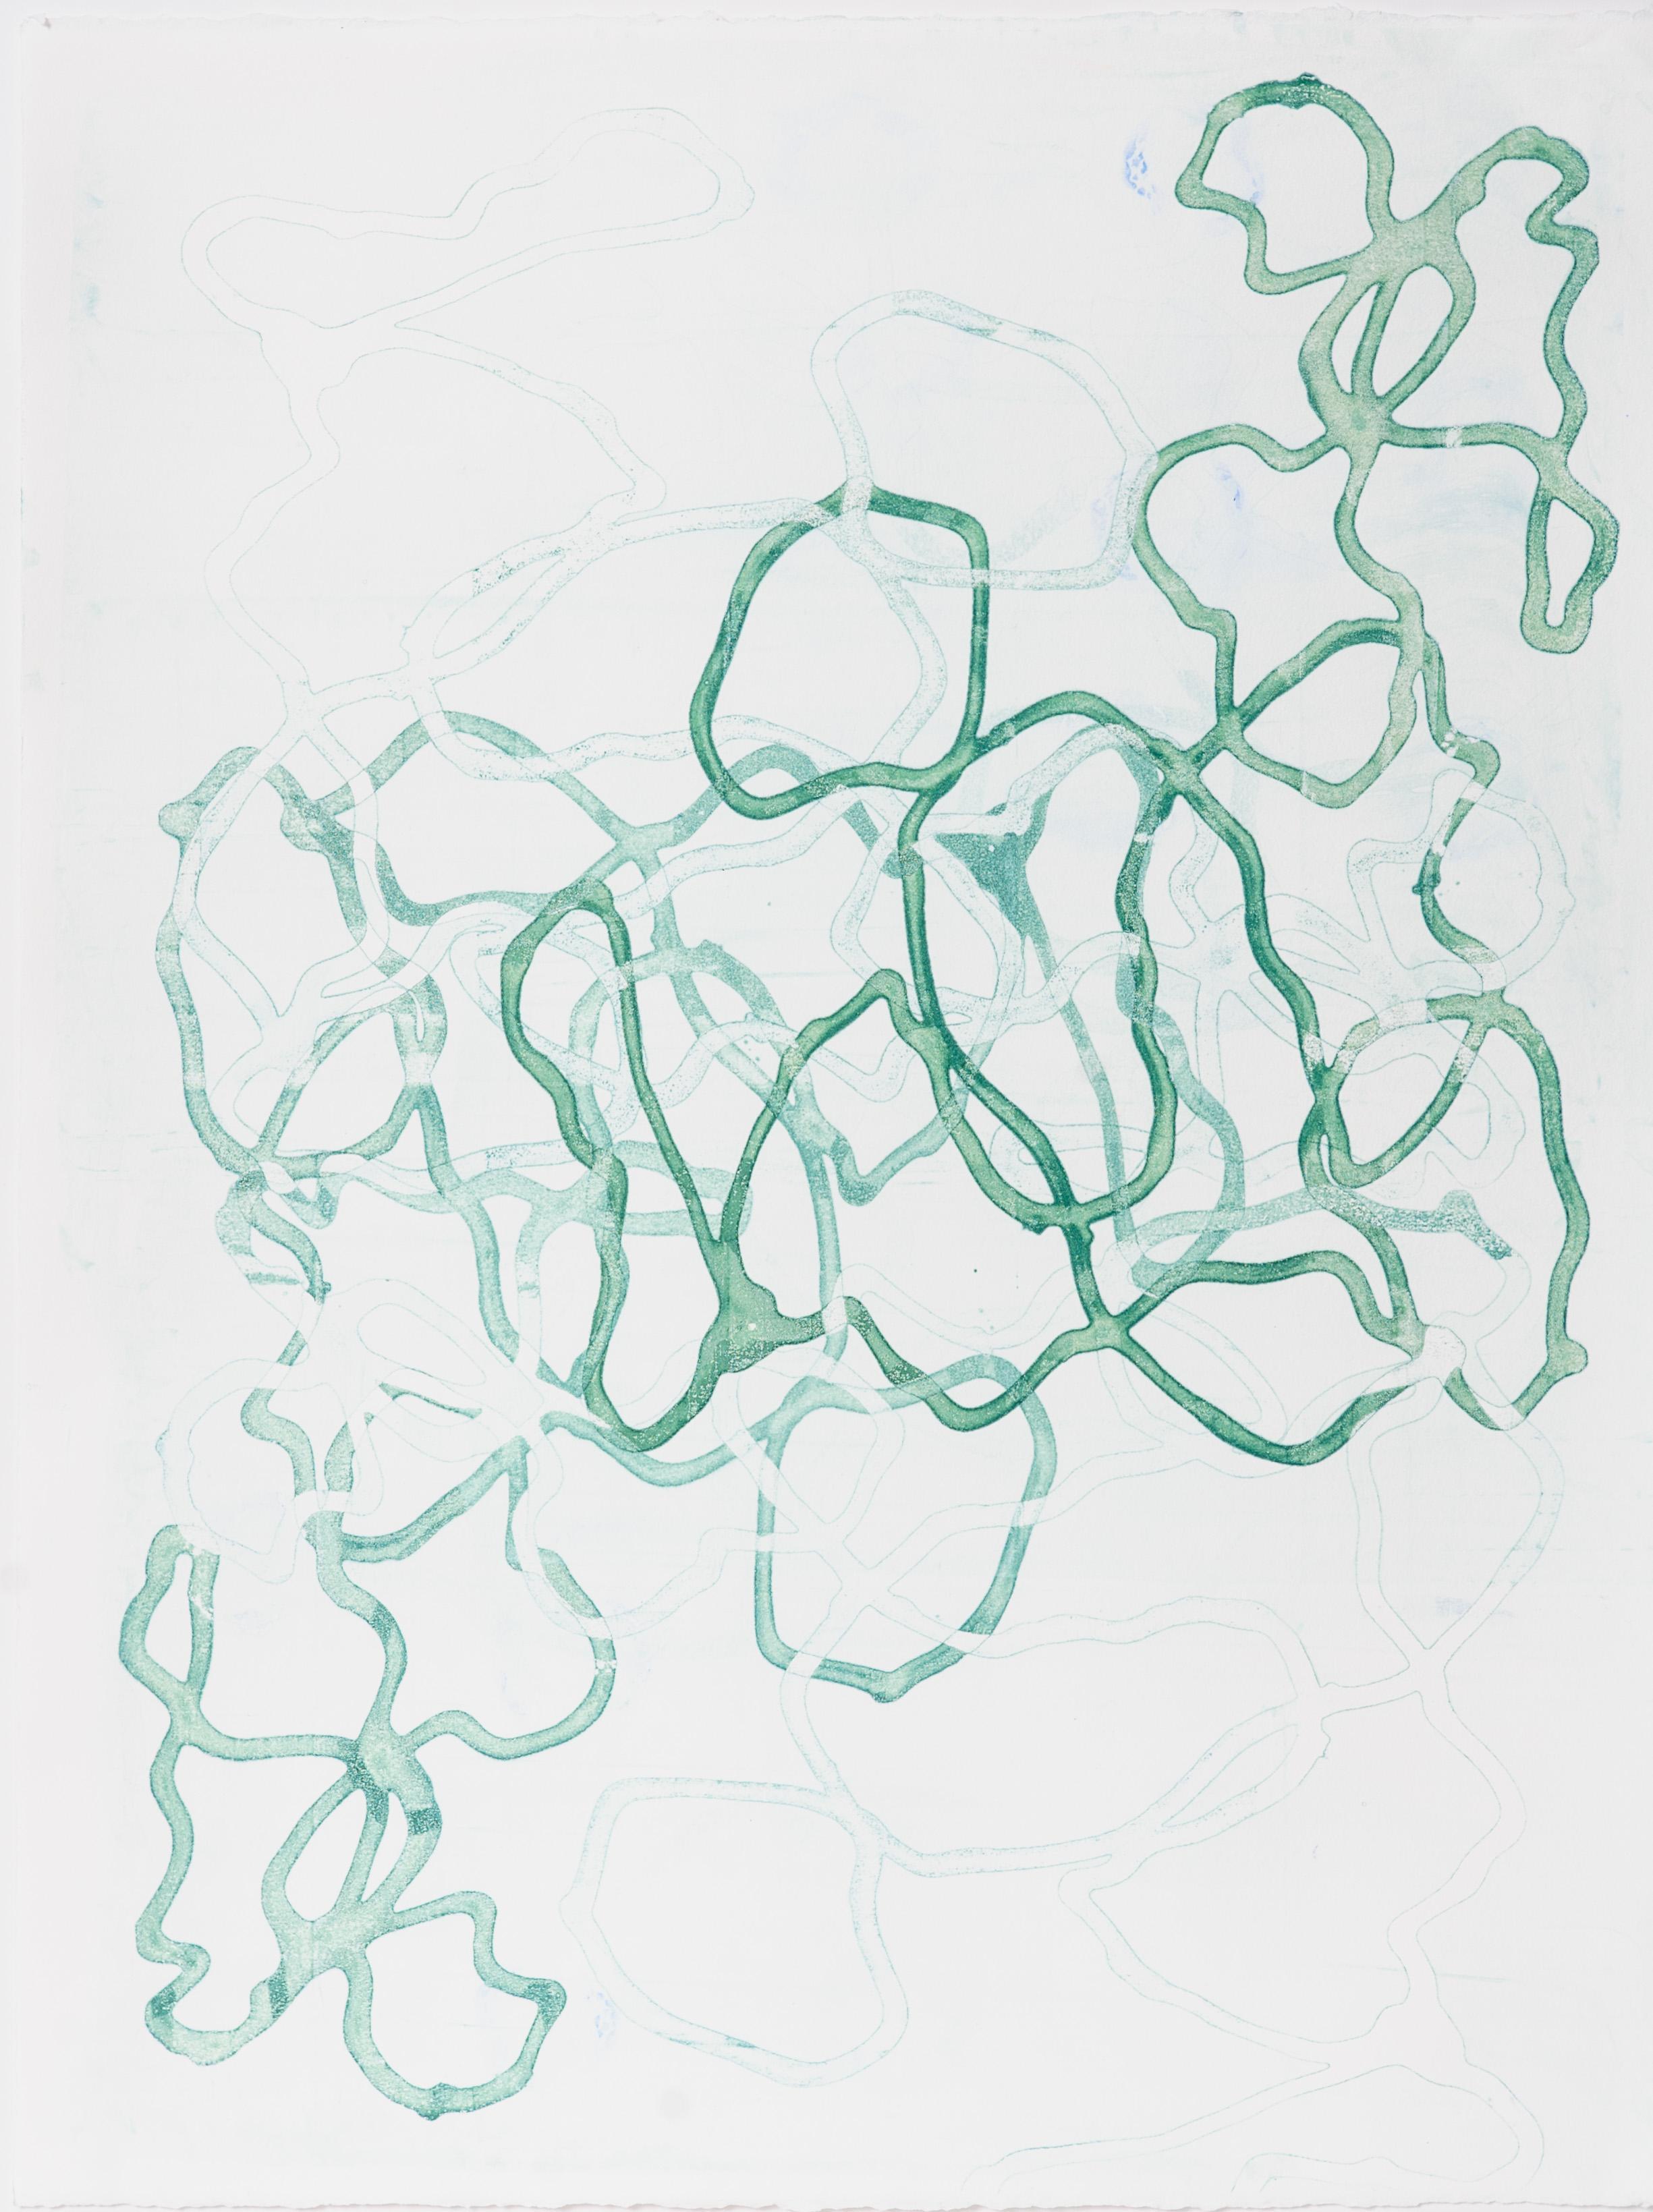 "Tangled V 20"" X 26"", silkscreen painting on paper"